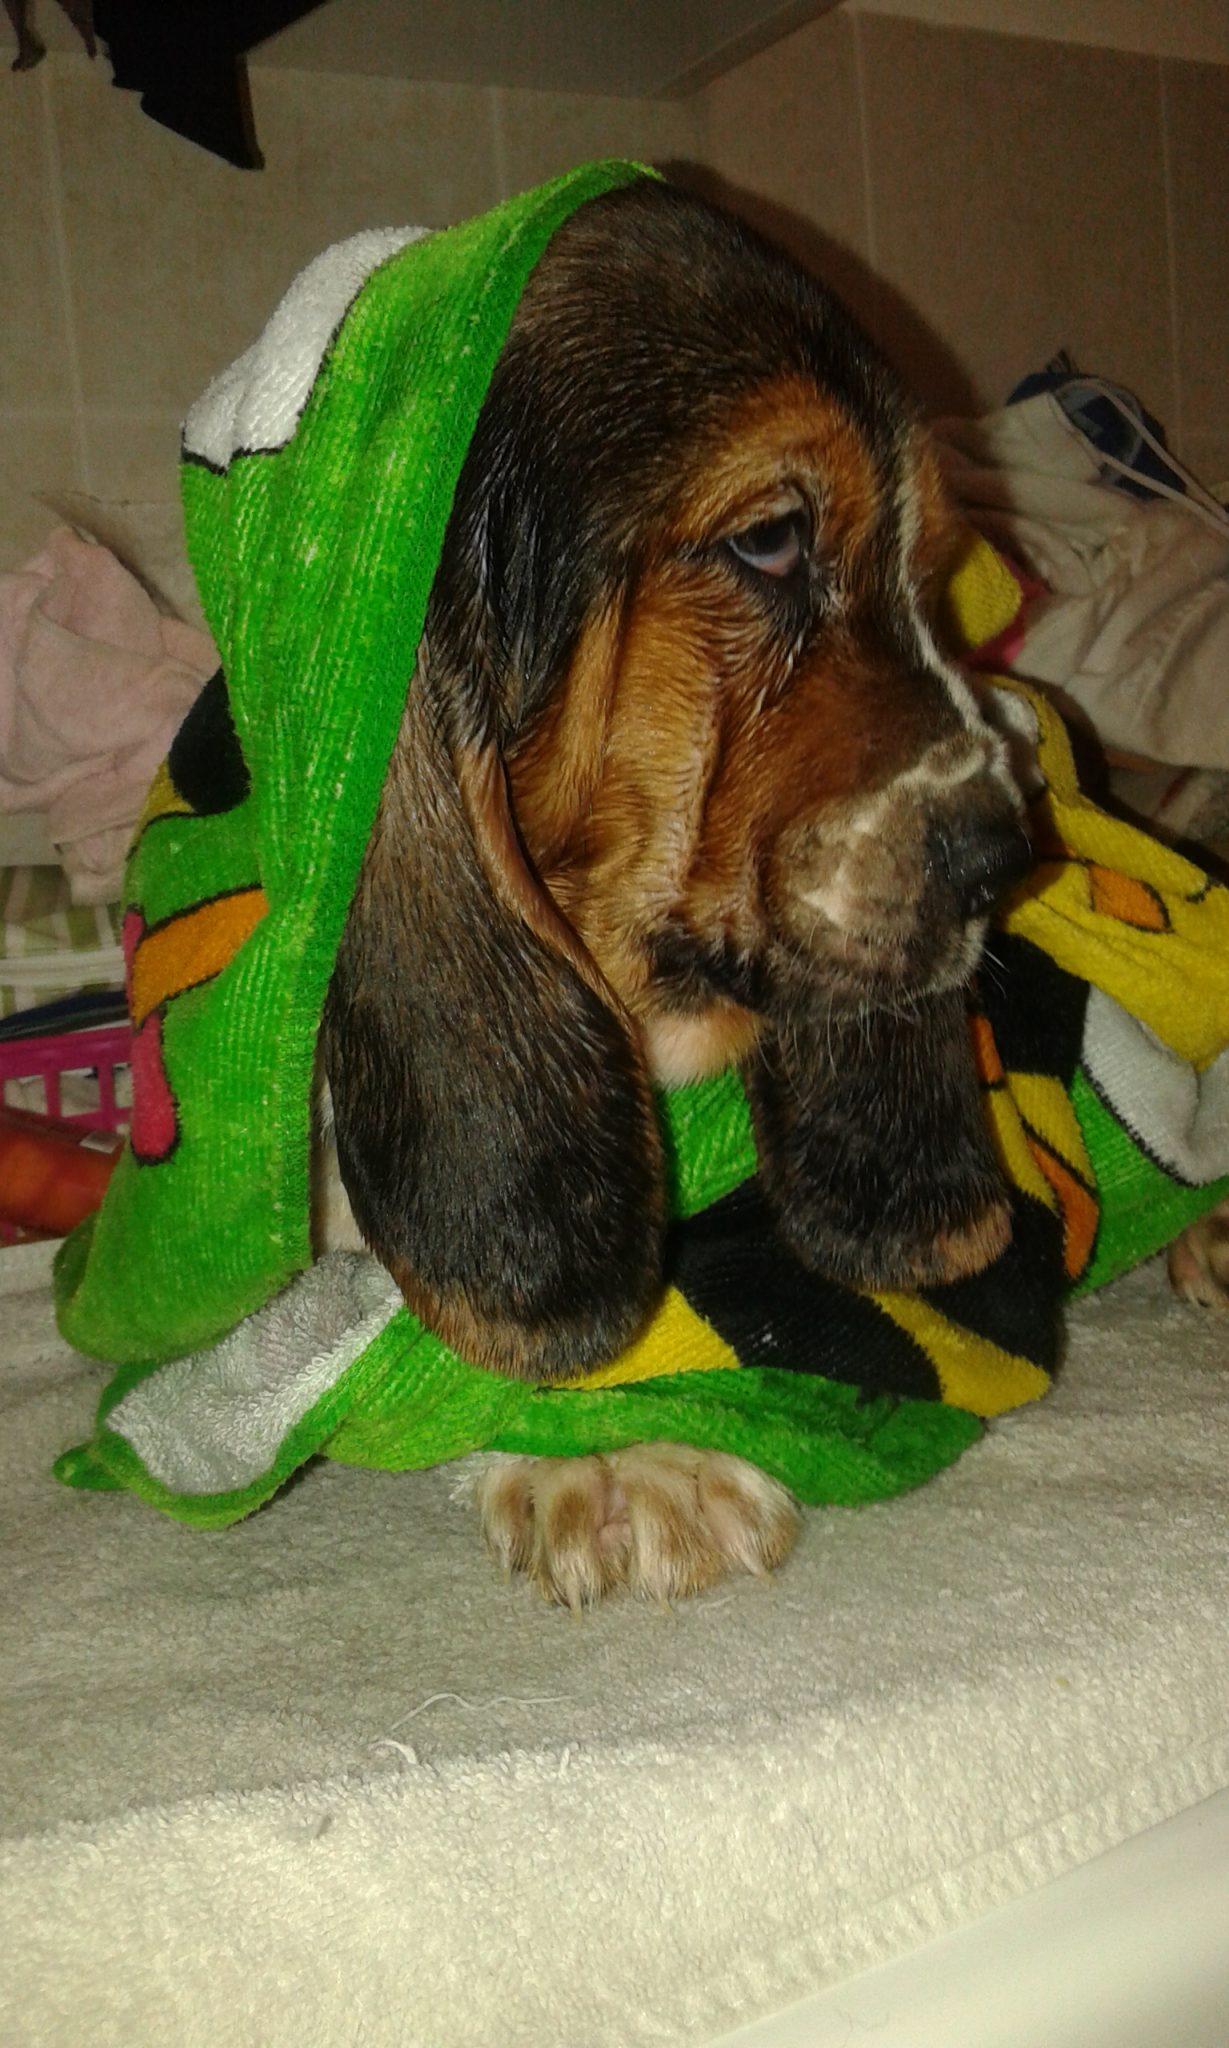 Basset Hound in casa - puppy basset e il bagnetto